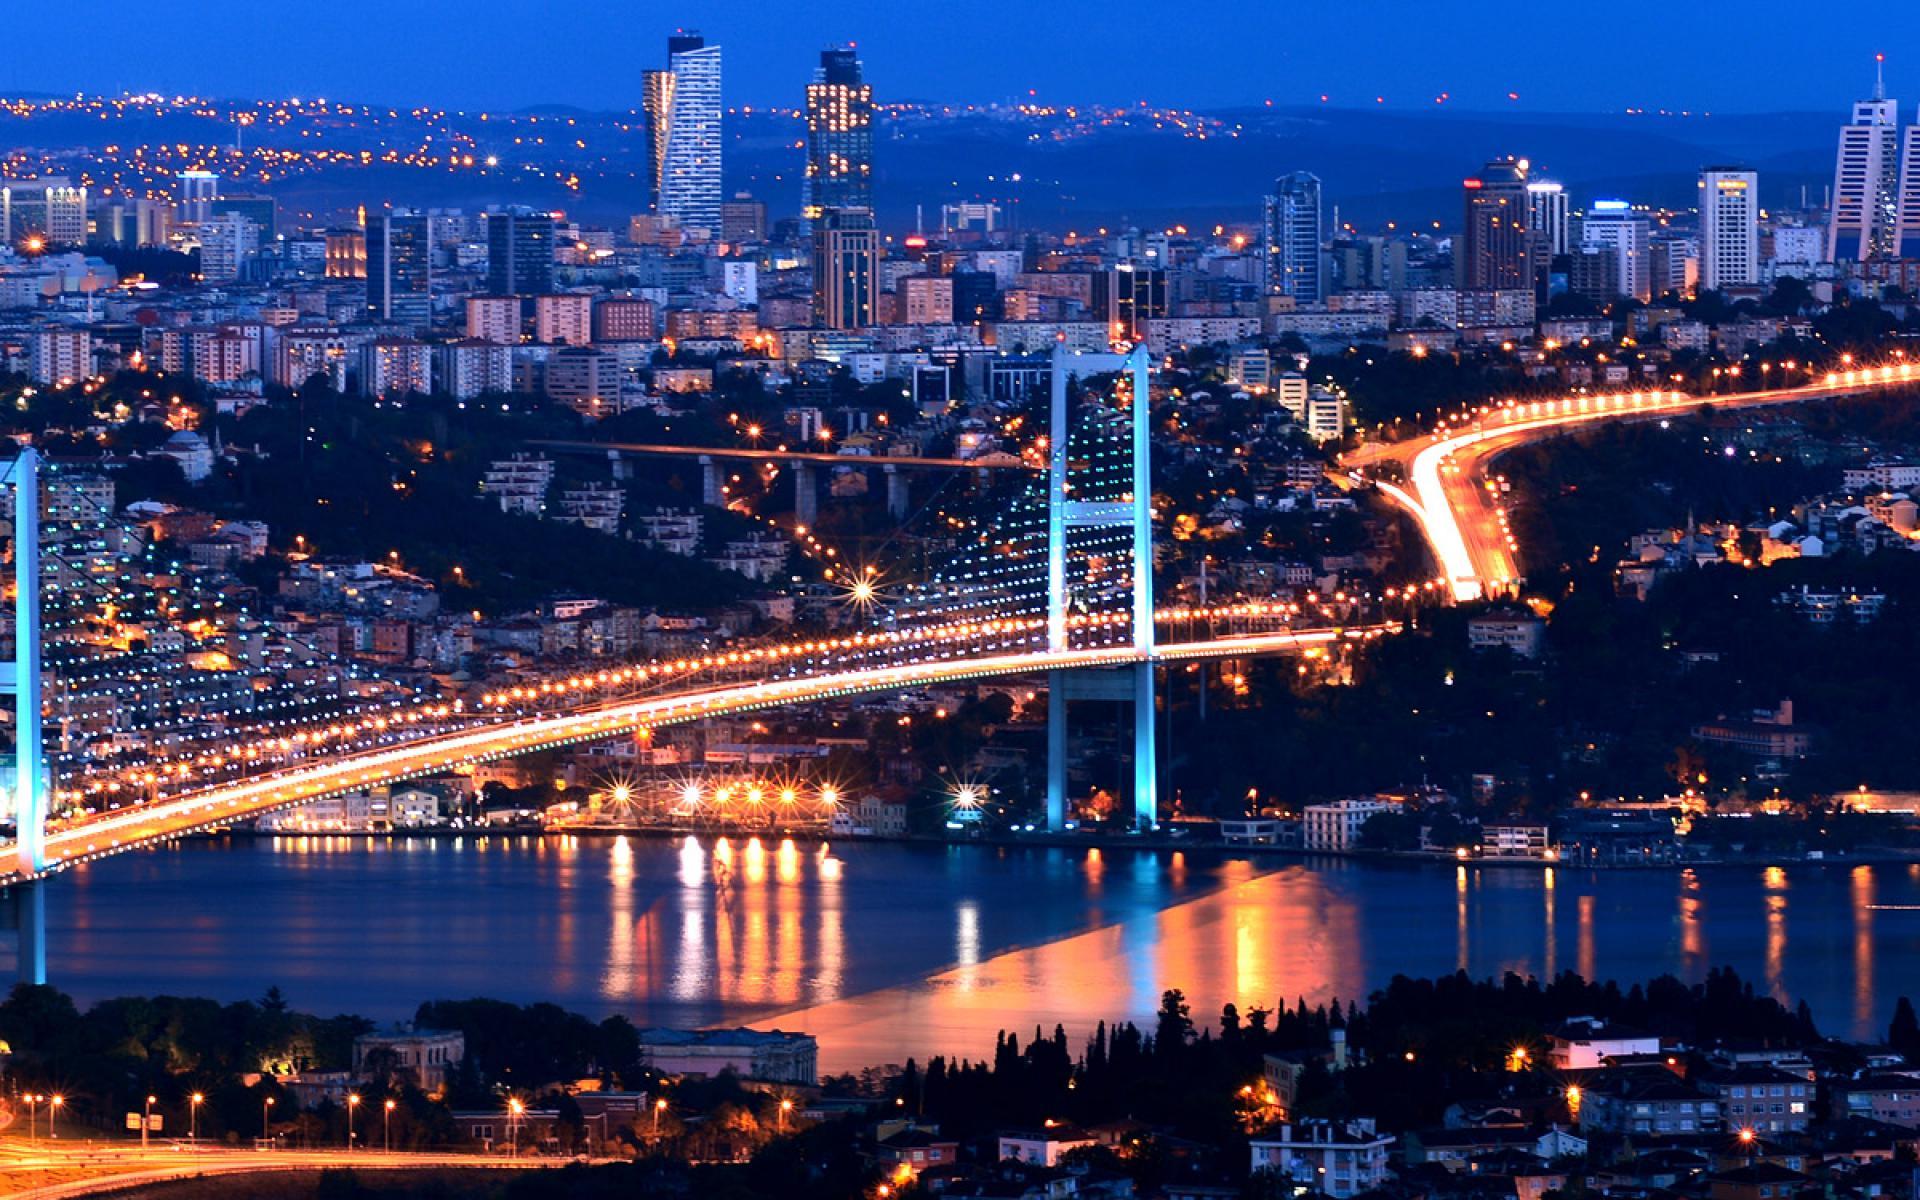 Türkiye Manzara UHD Foto